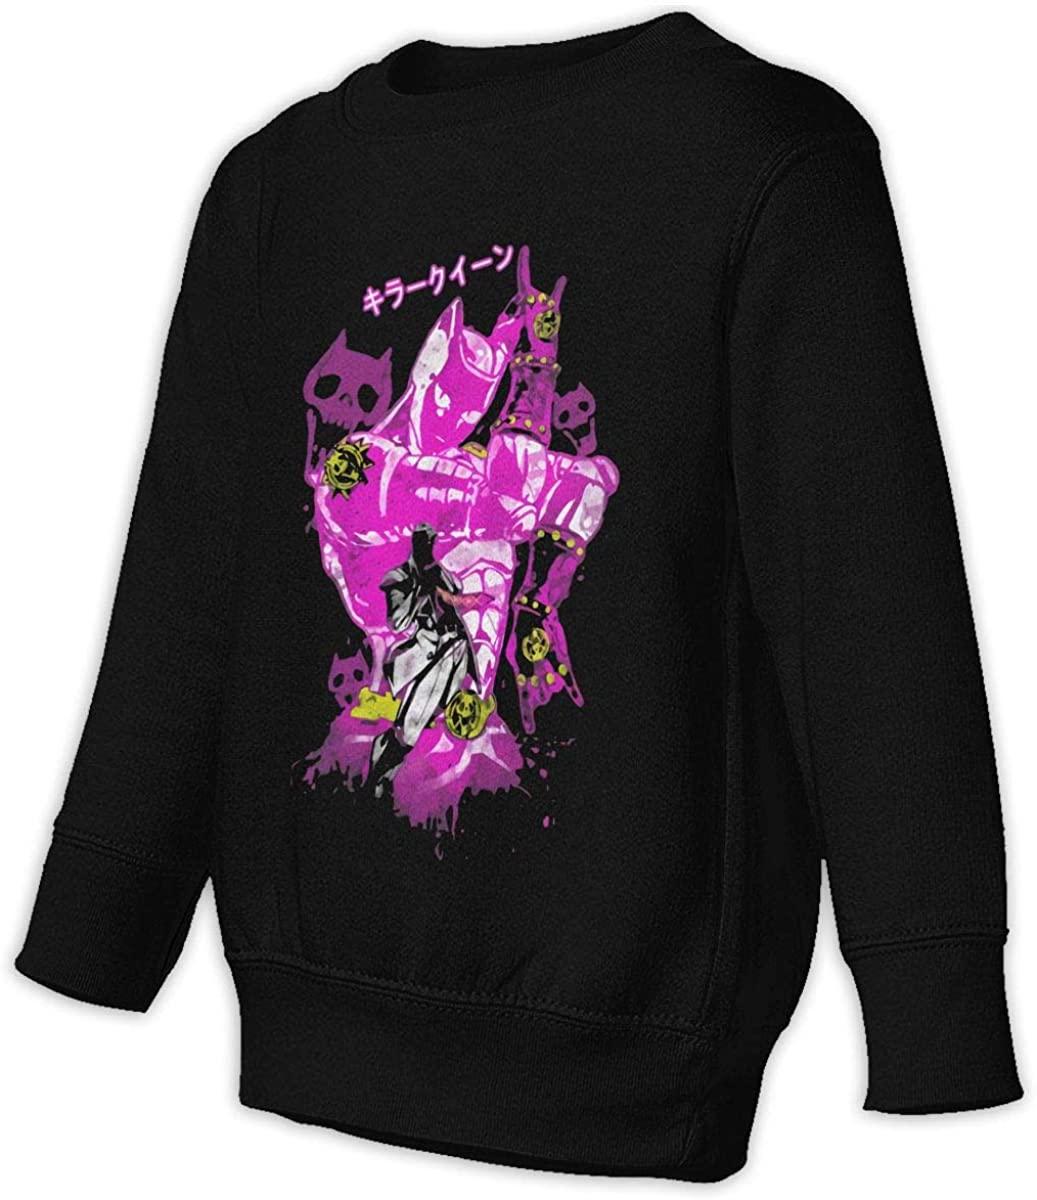 ASFSDGSDG JoJo's Bizarre Adventure Unisex Sweatshirt Youth Boy and Girls Pullover Sweatshirt